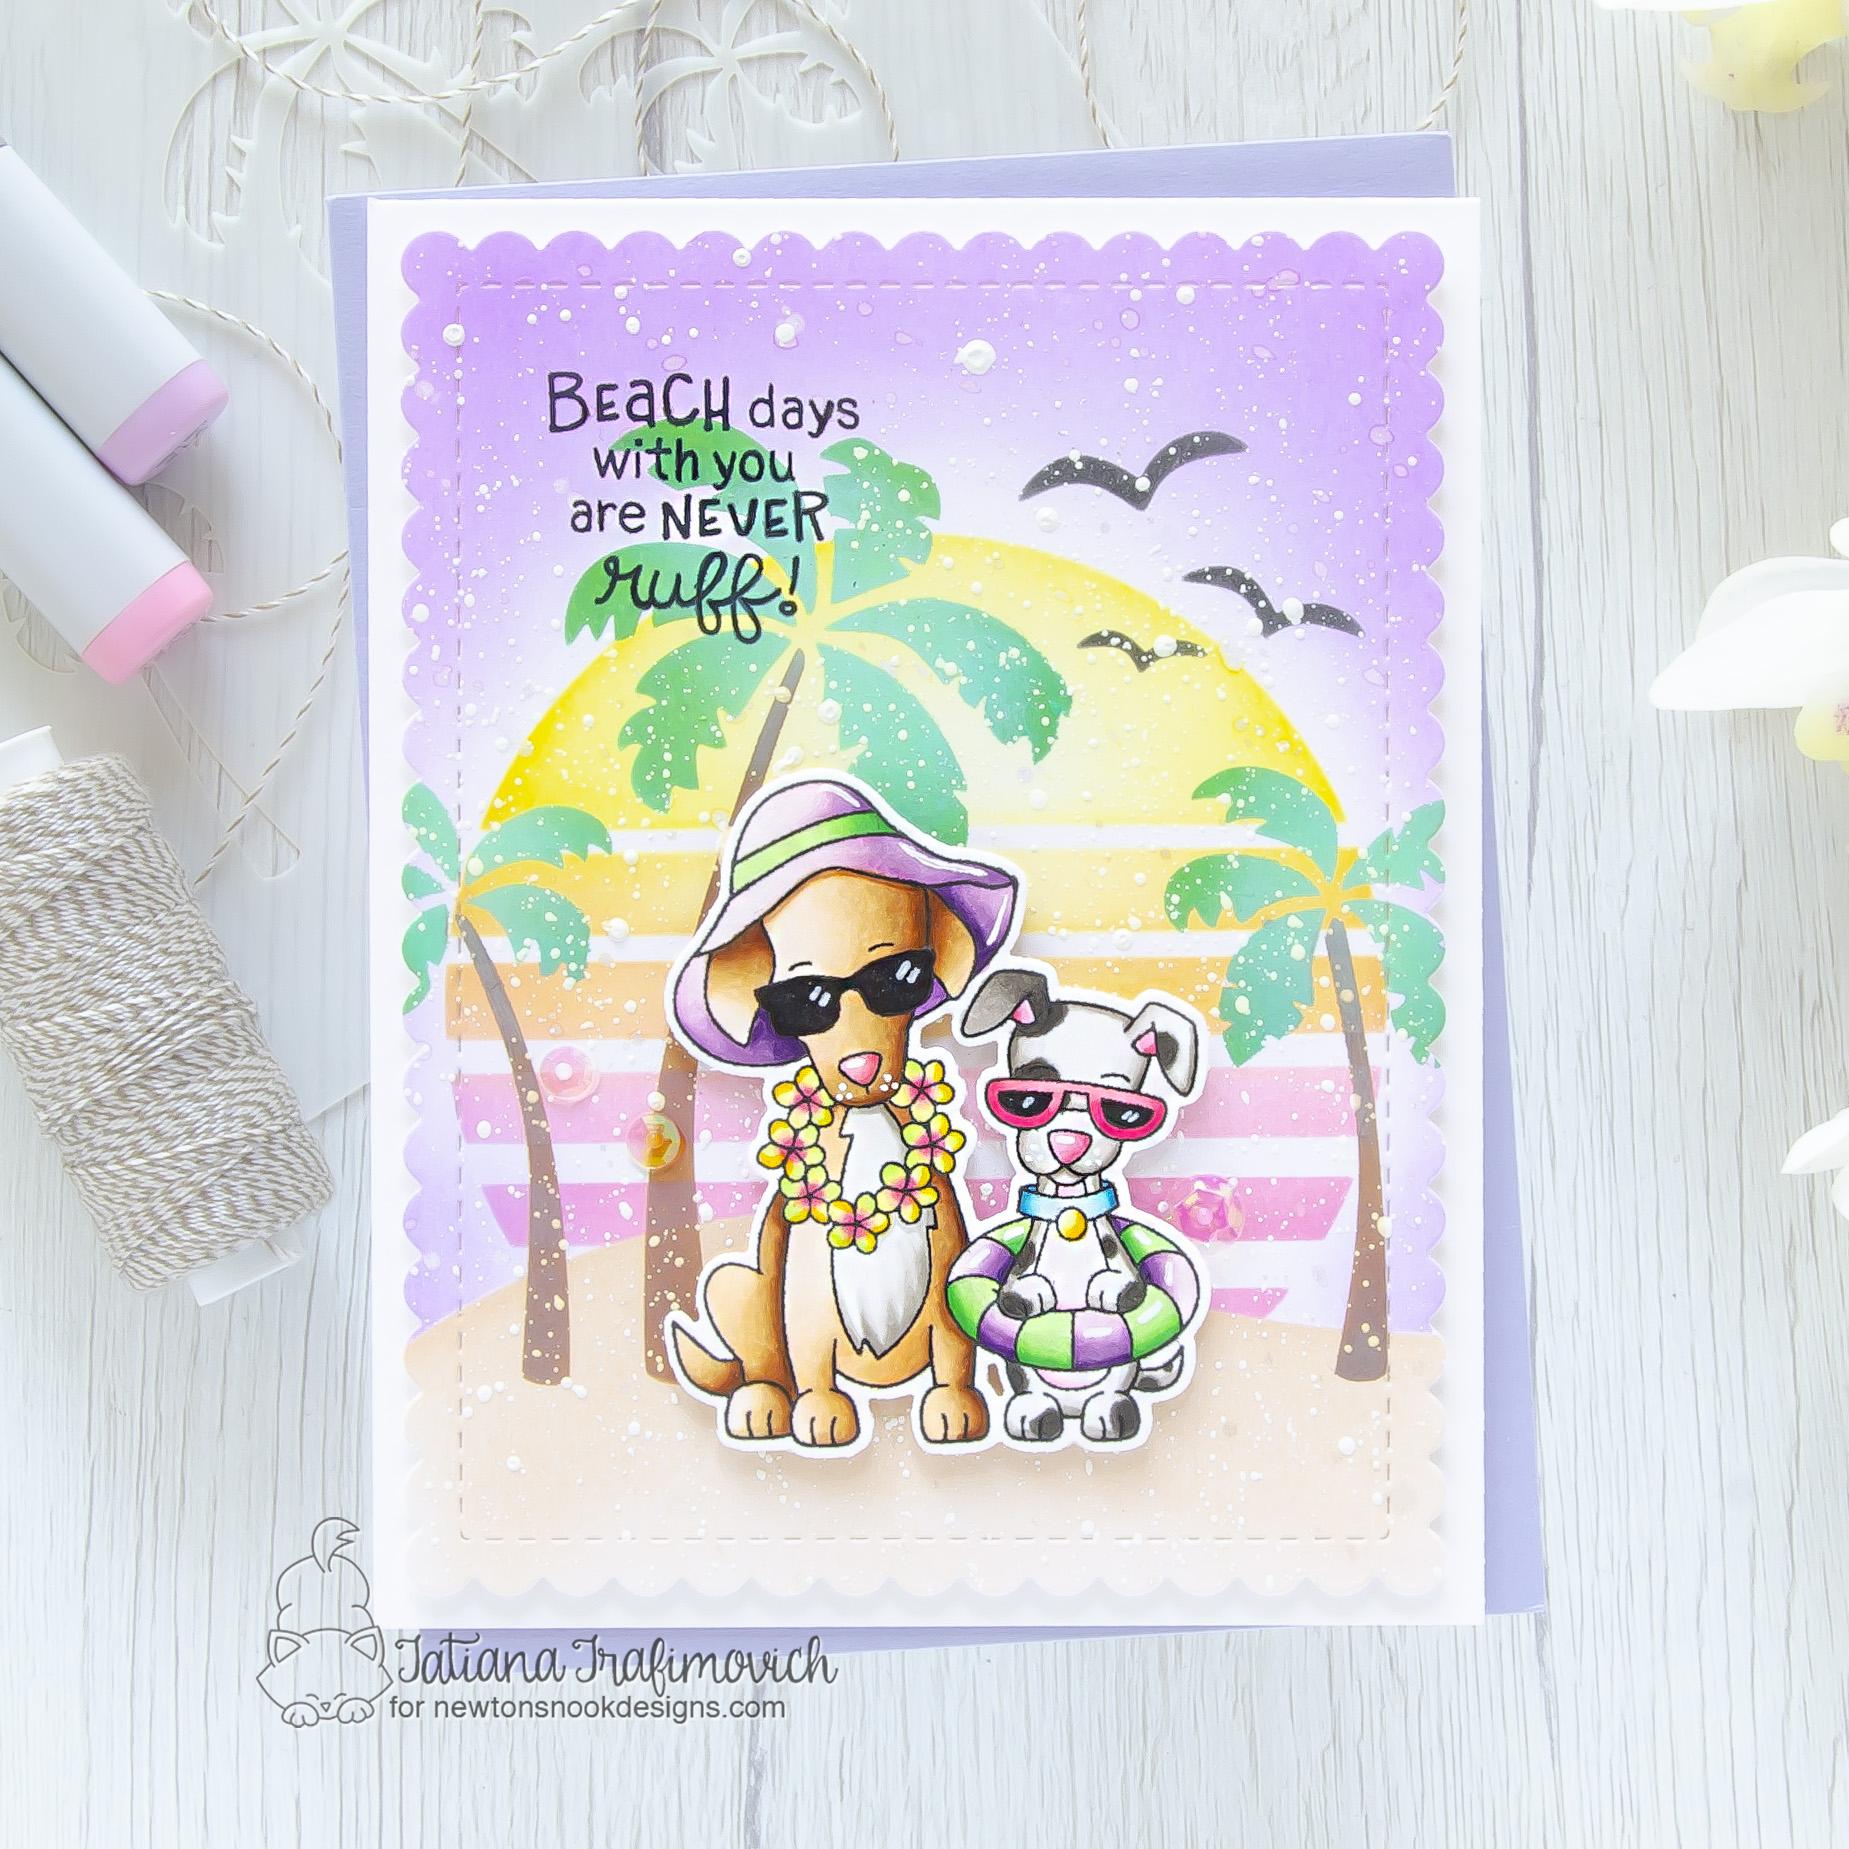 Beach Days With You Are Never Ruff #handmade card by Tatiana Trafimovich #tatianacraftandart - Beach Barks stamp set by Newton's Nook Designs #newtonsnook